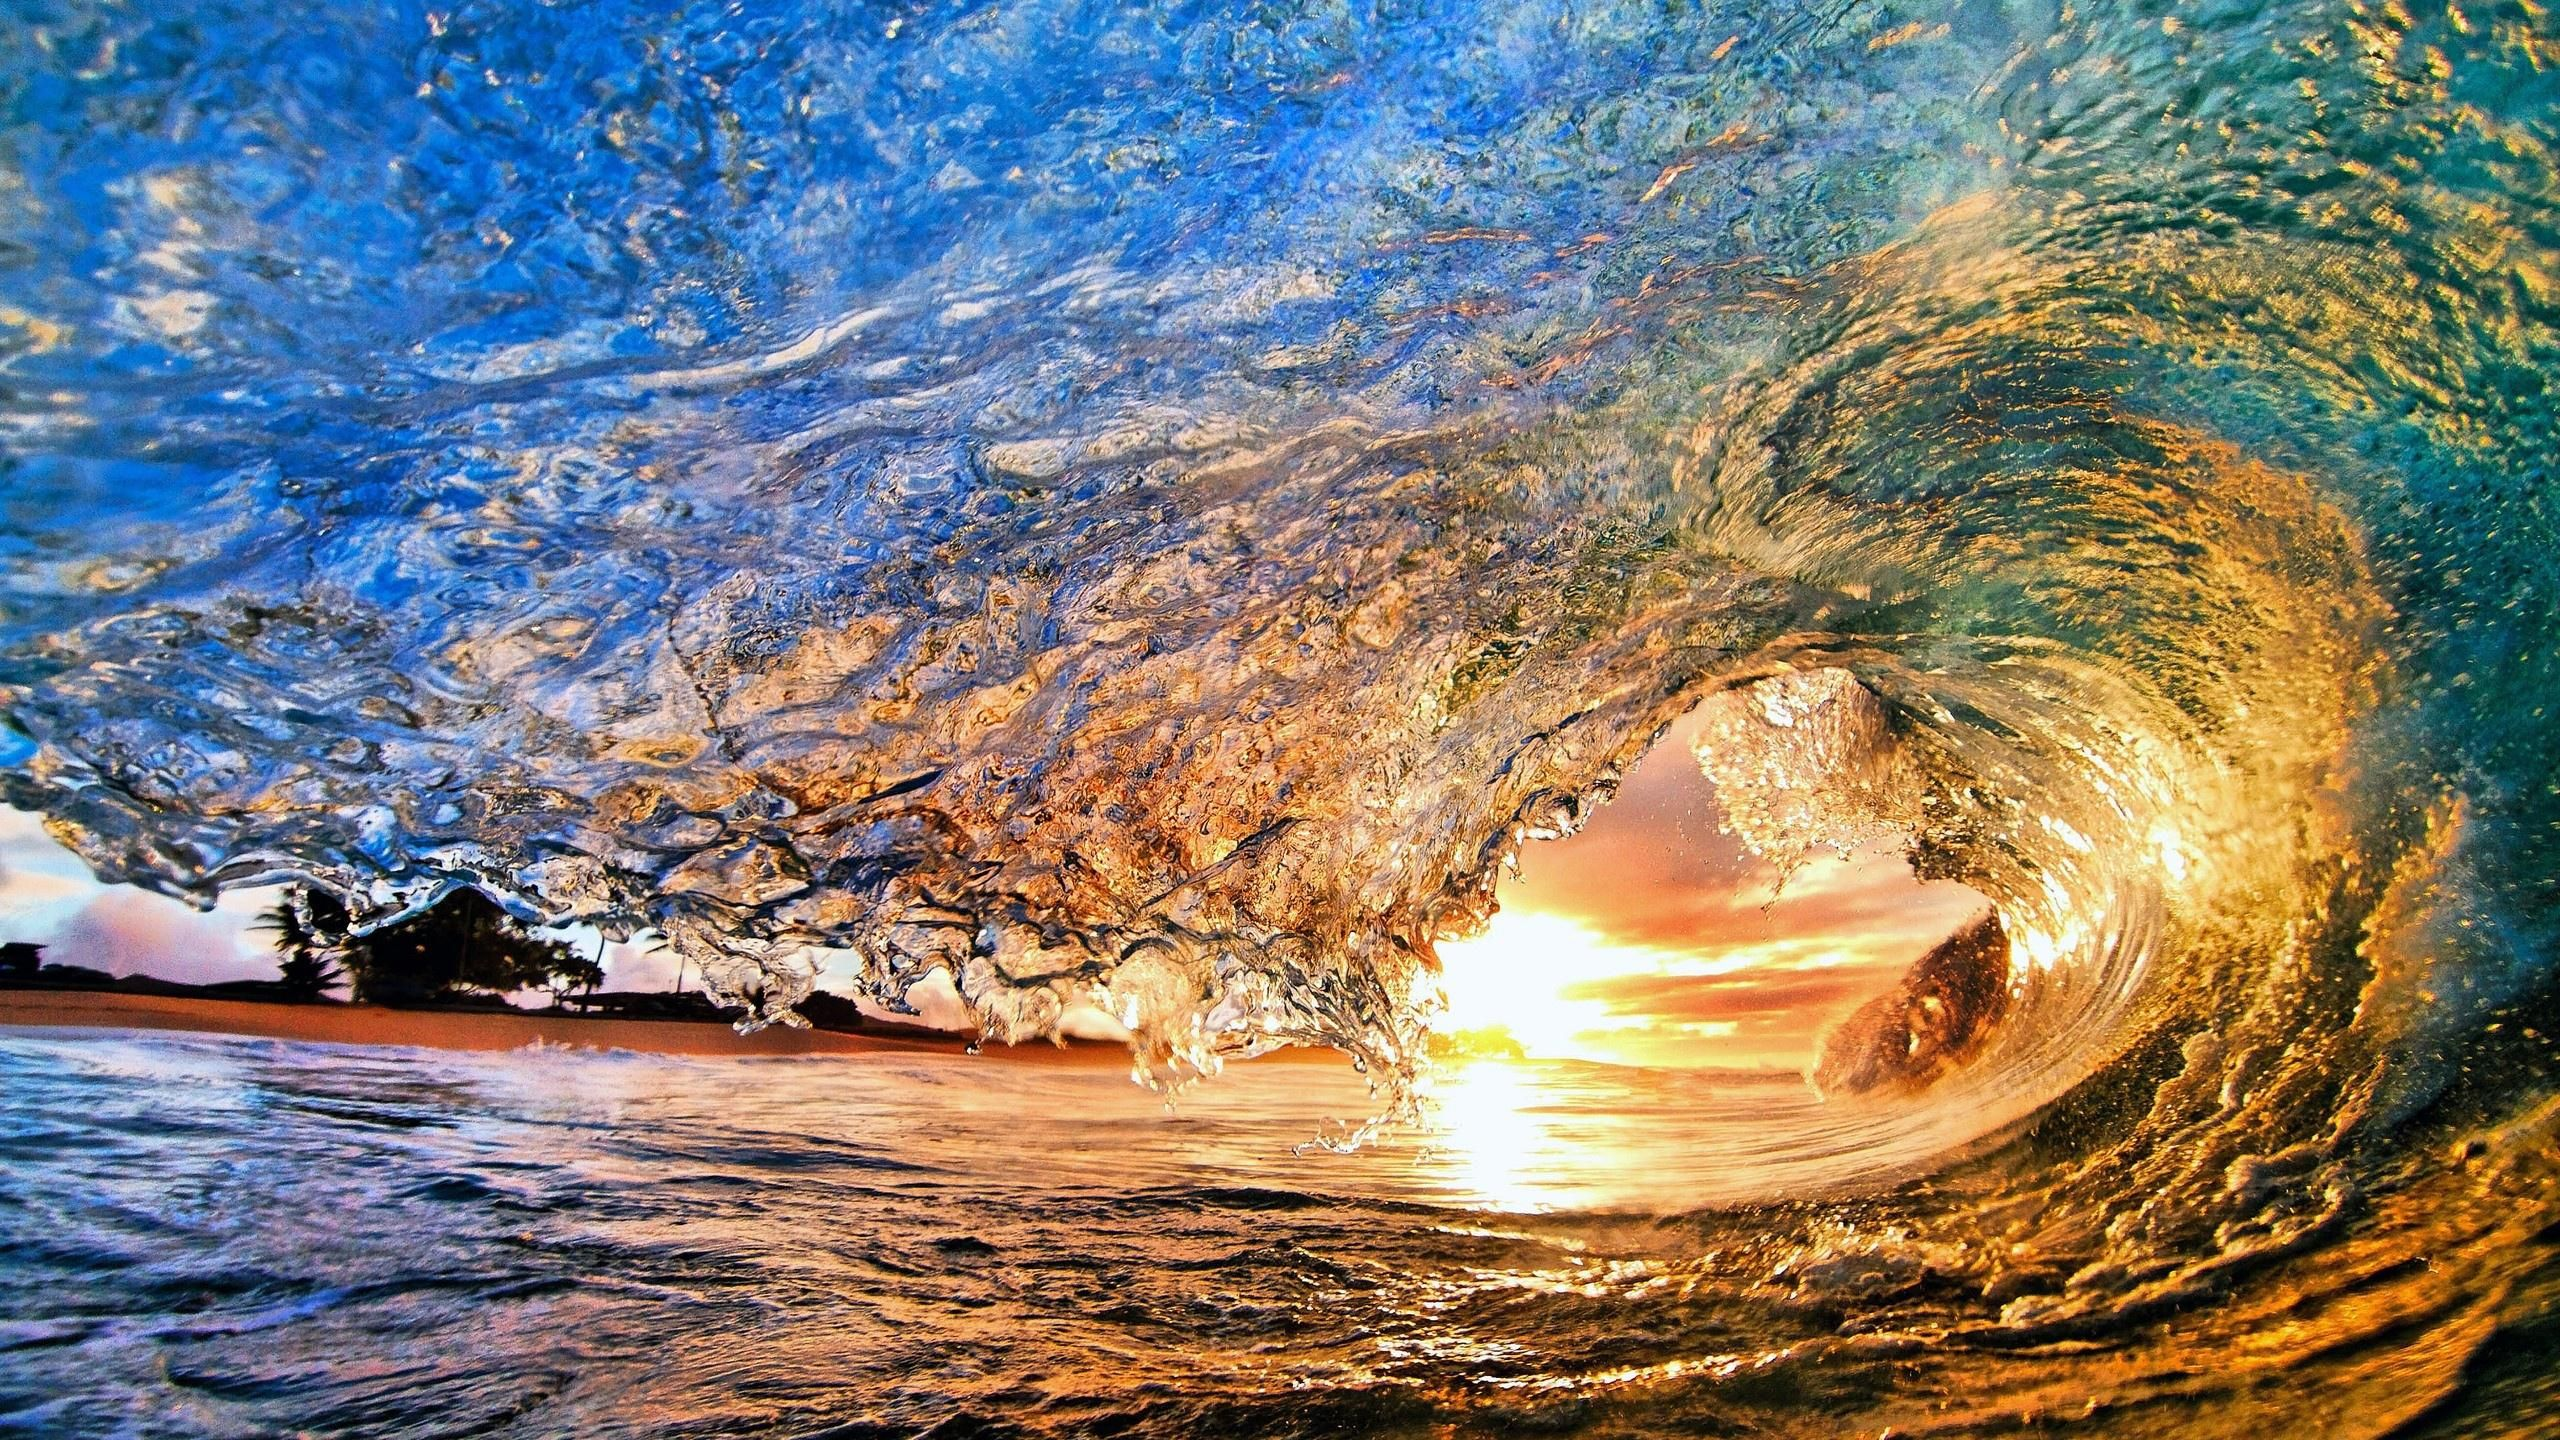 Hawaii Wallpapers HD Doğa fotoğrafçılığı, Okyanus